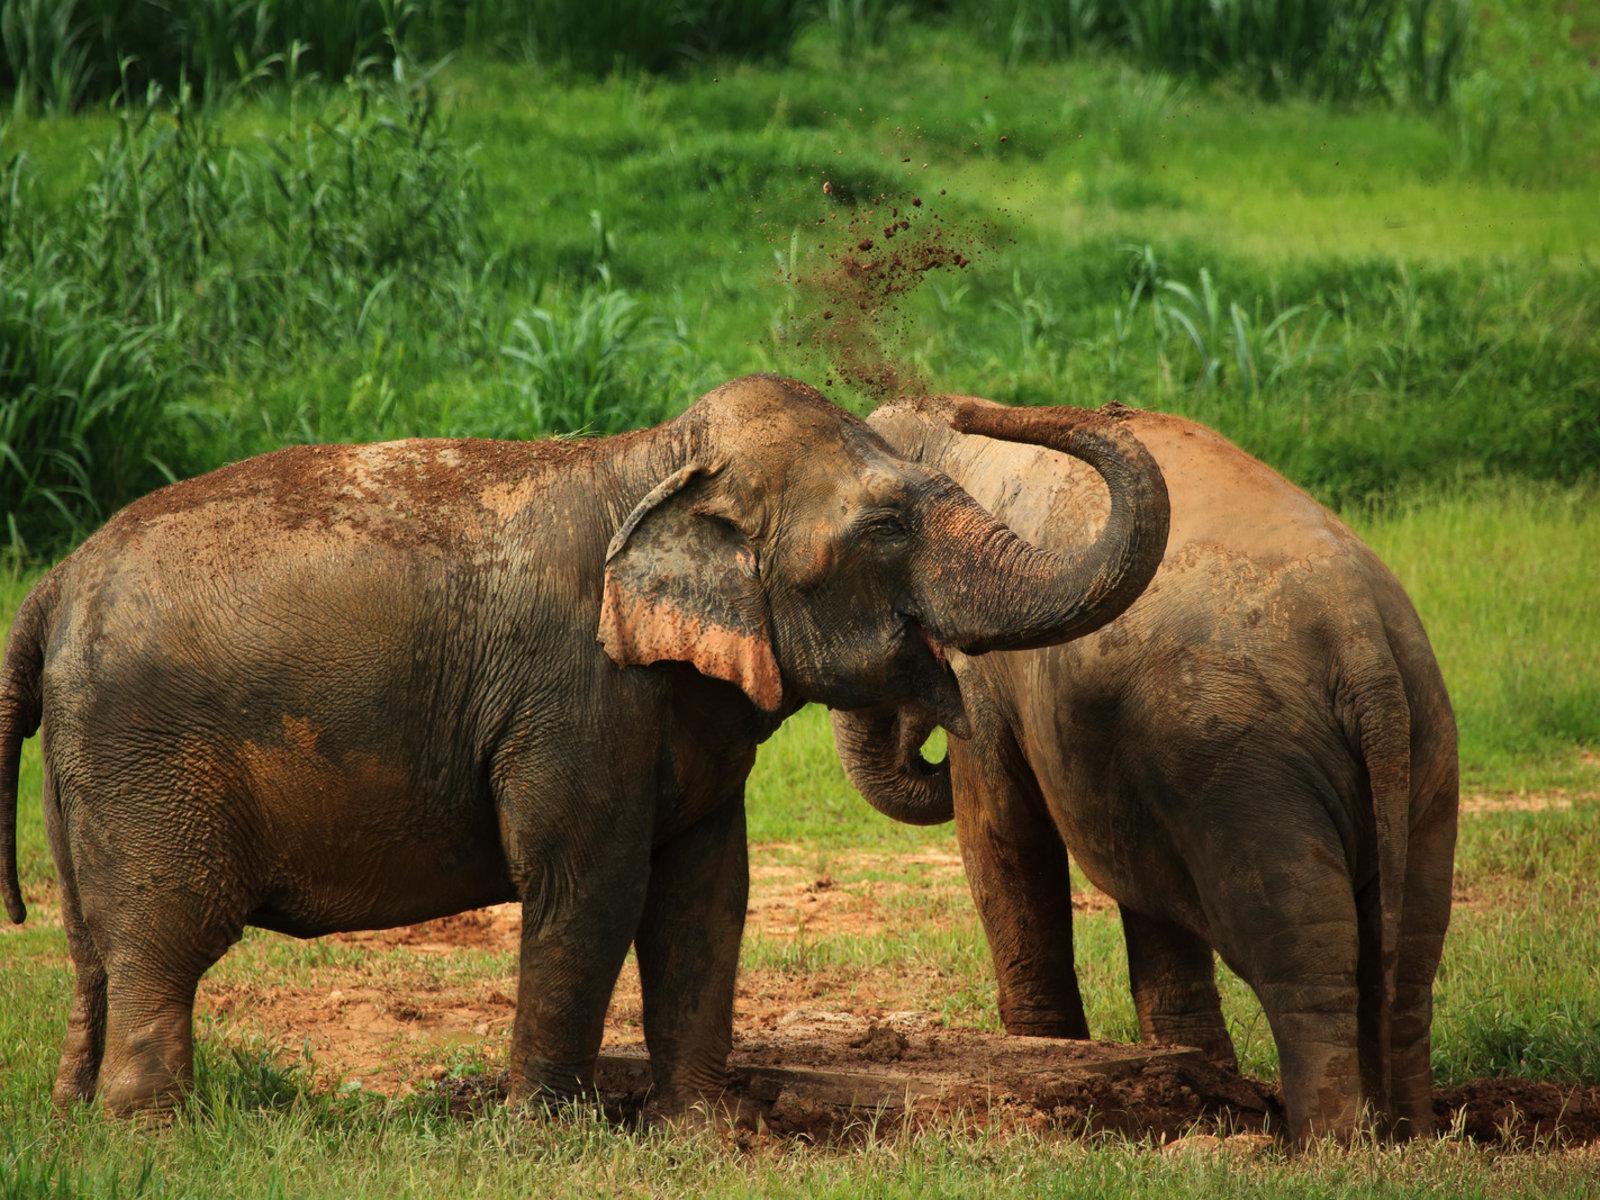 Elefanten in Campnähe